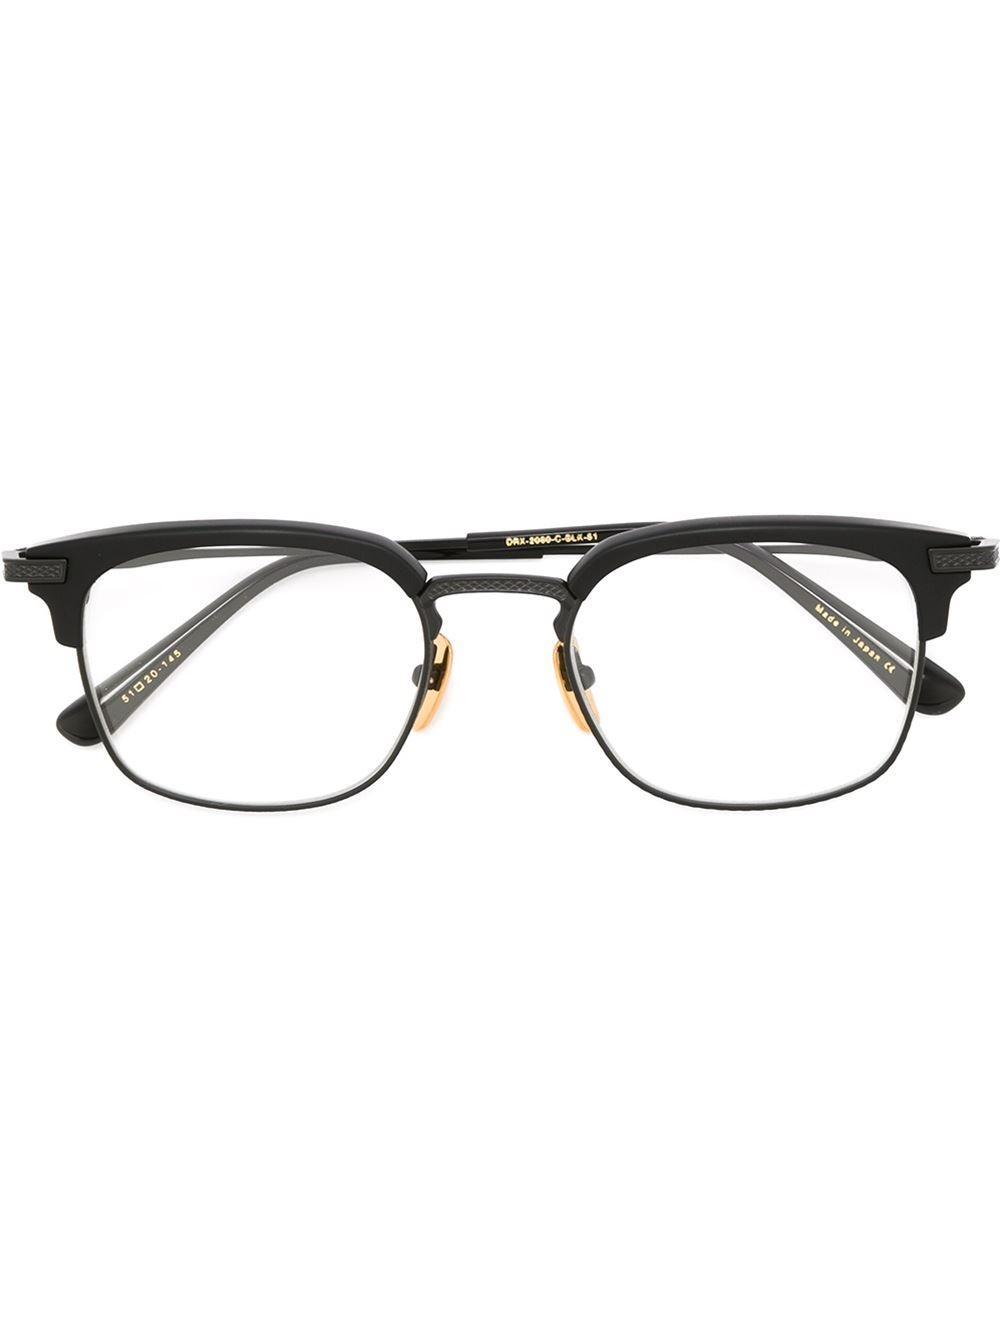 707c34cef1e8 Lyst - Dita Eyewear  nomad  Glasses in Black for Men